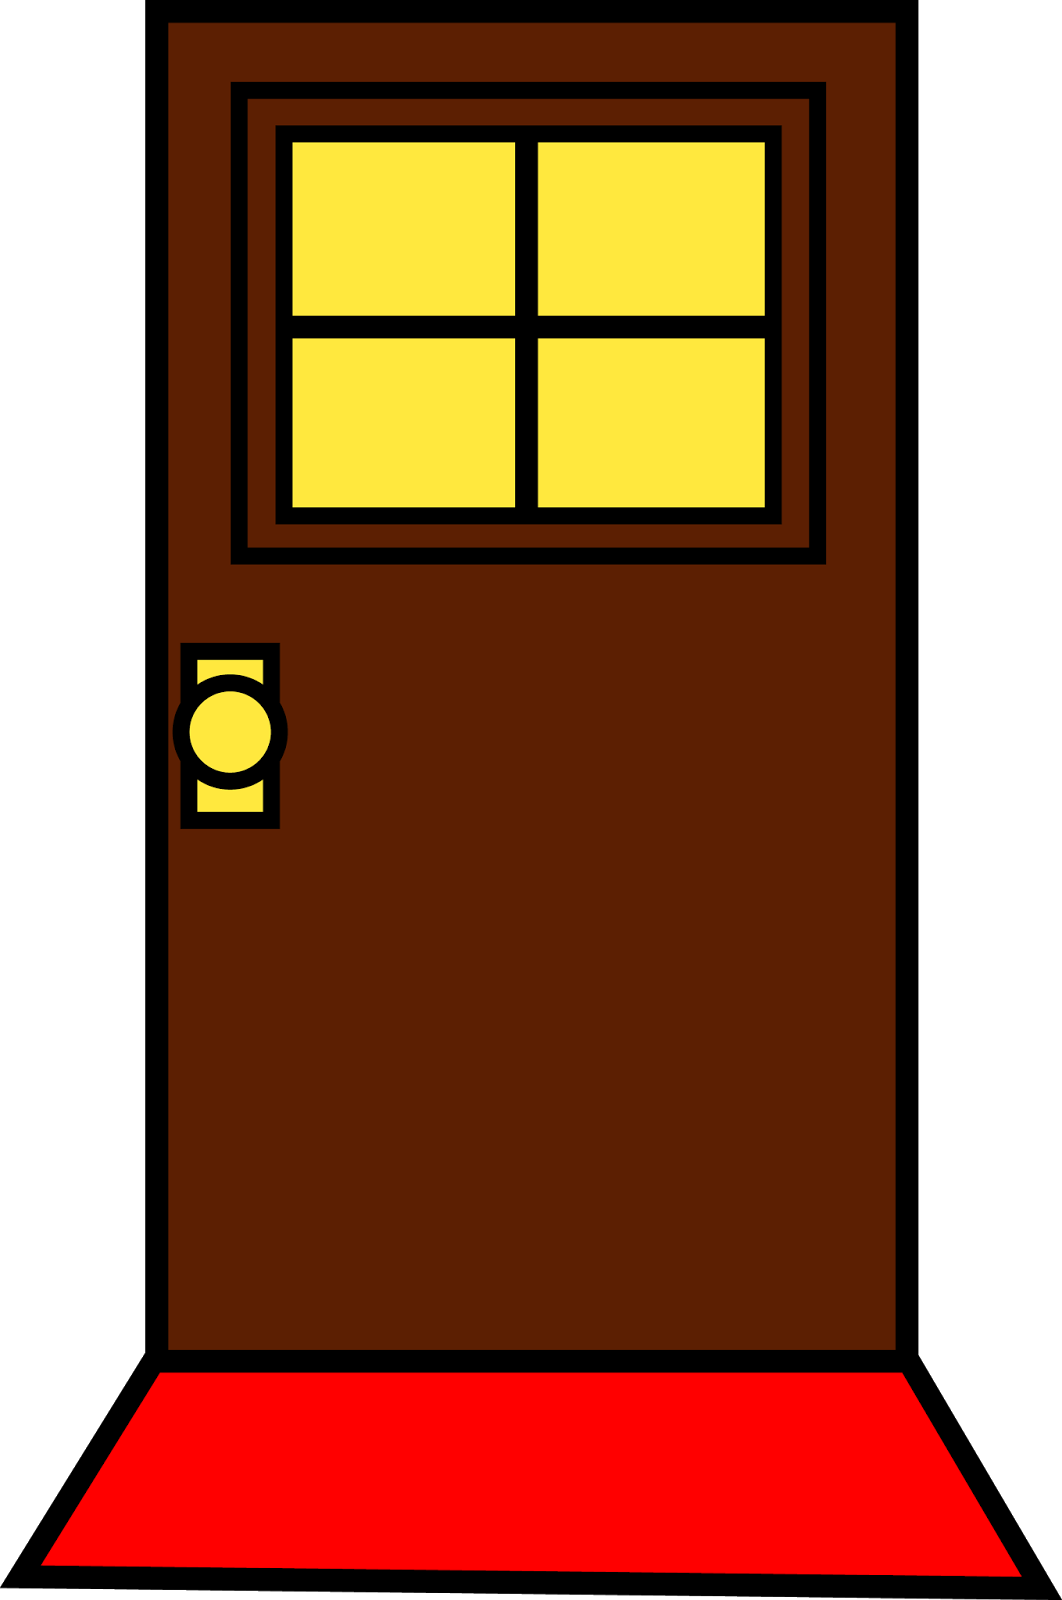 Closed Door Drawing simple door drawing